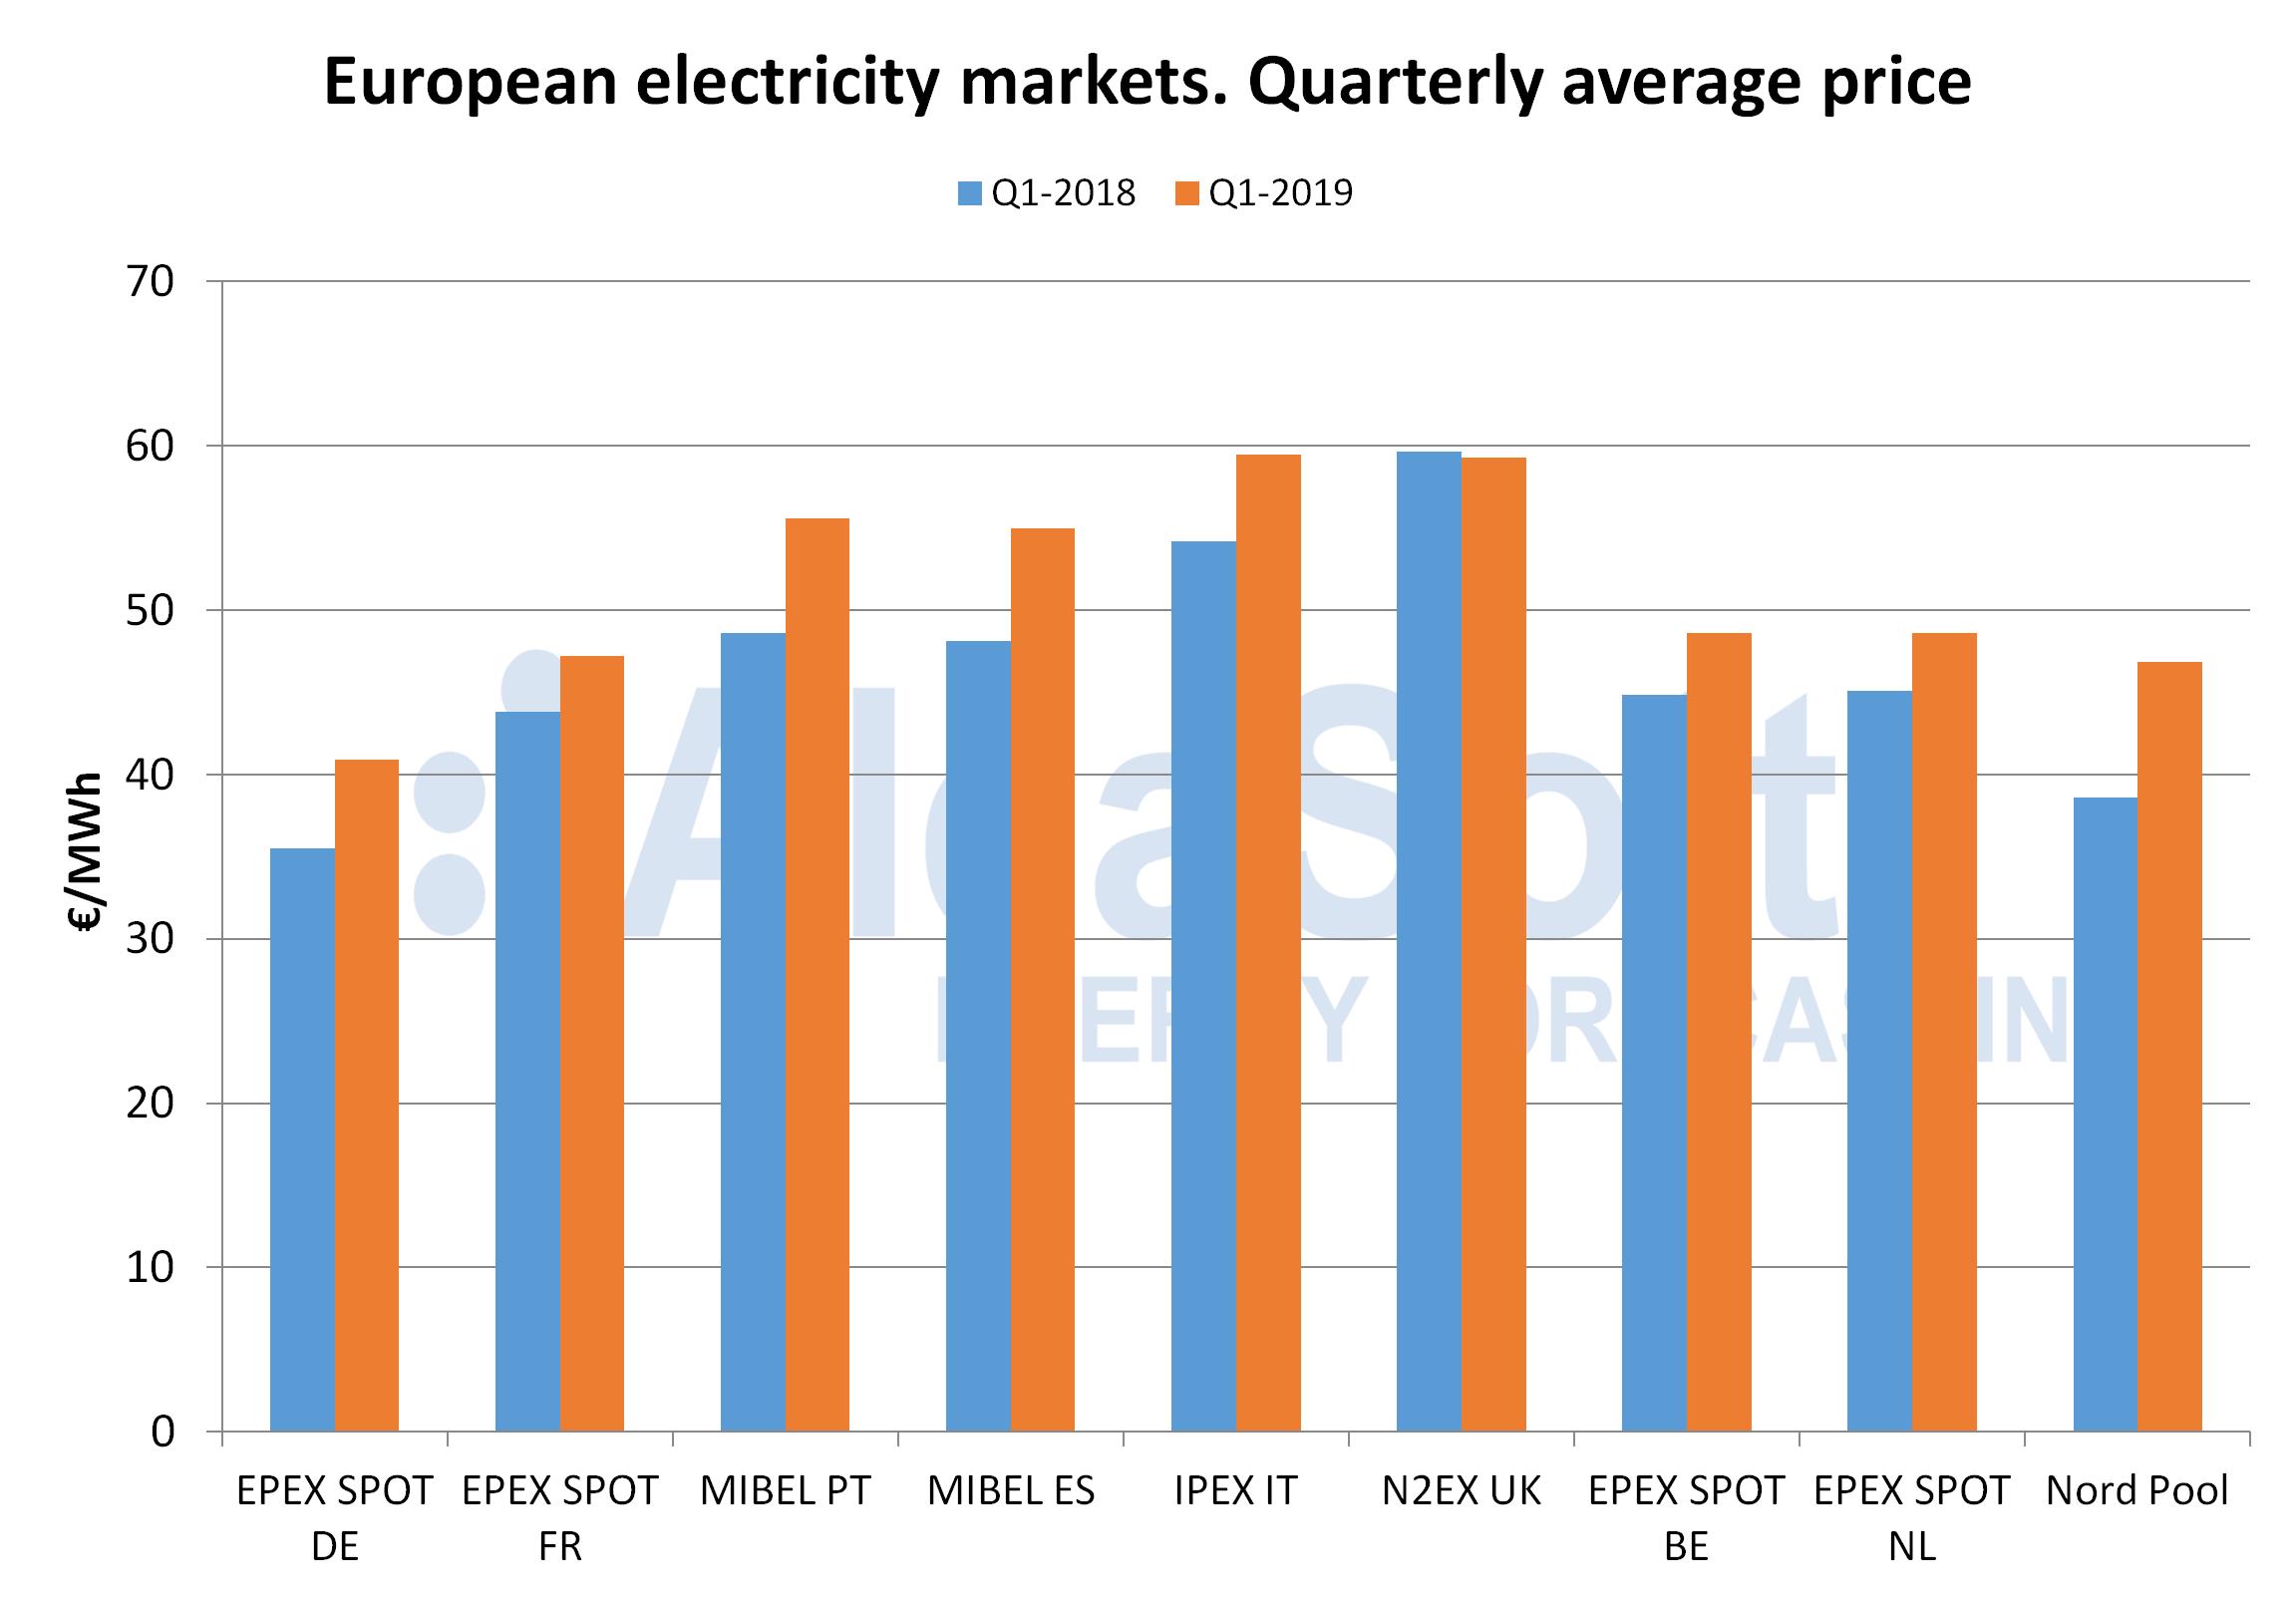 AleaSoft - European electricity market quarterly average prices